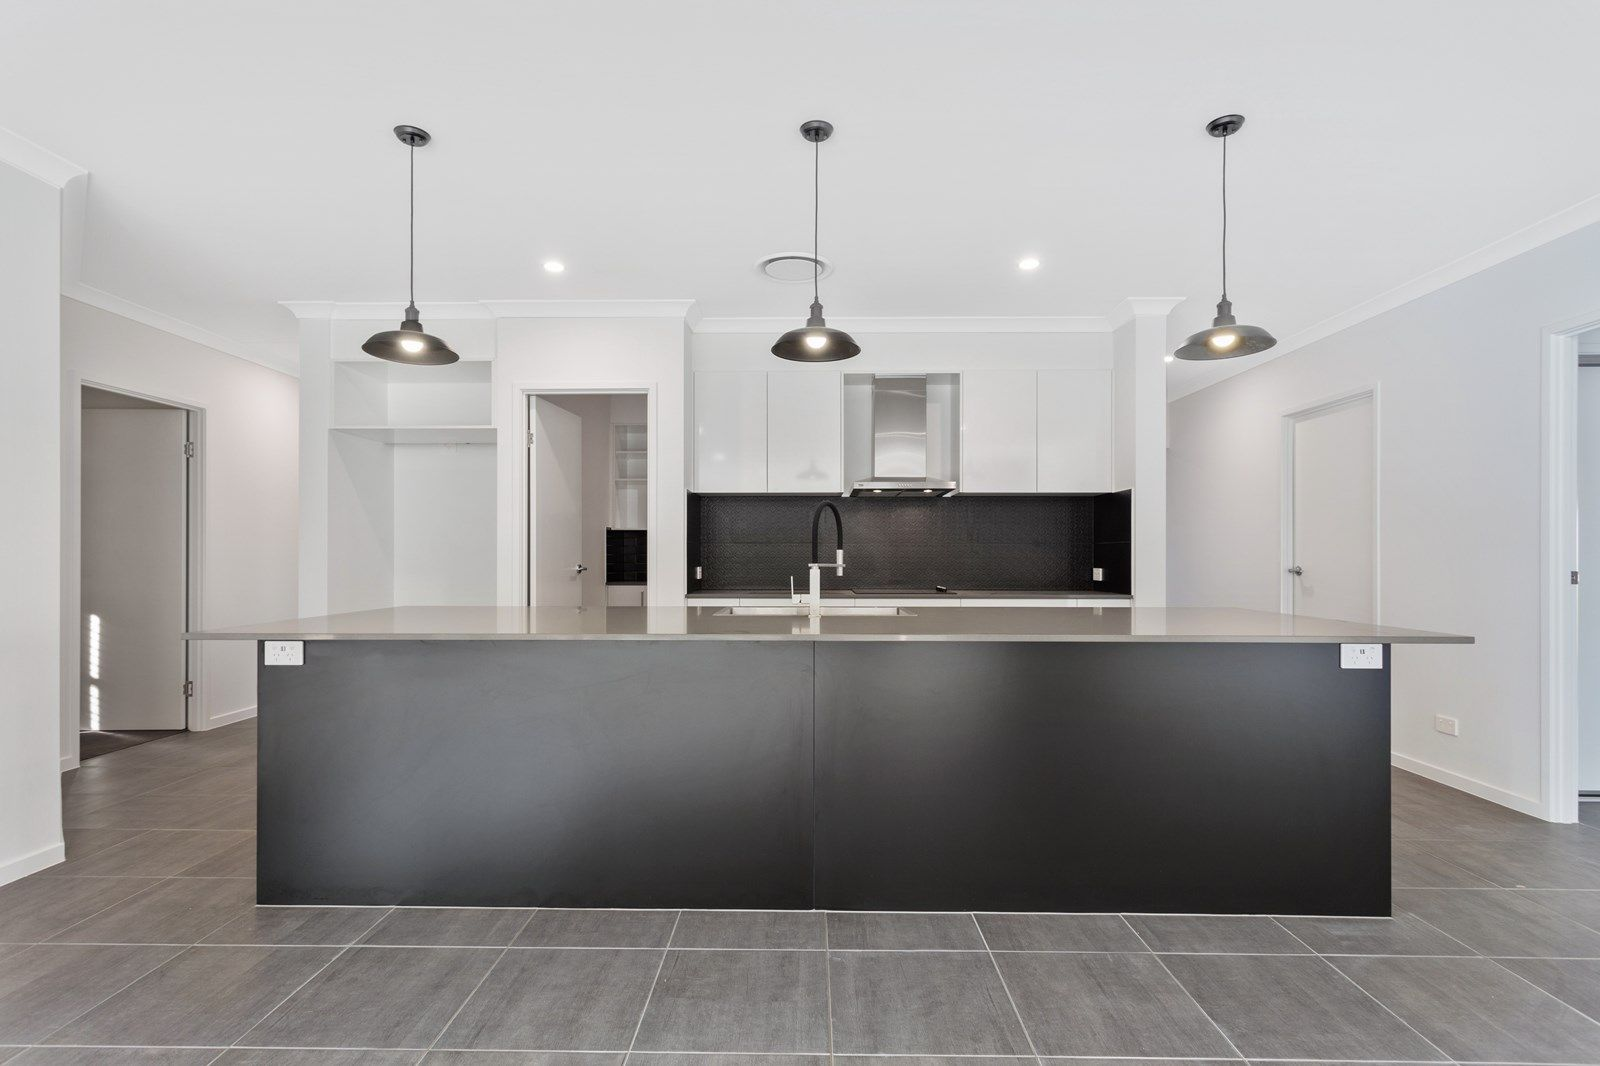 Lot 7 Cedarwood Place, Landsborough QLD 4550, Image 2